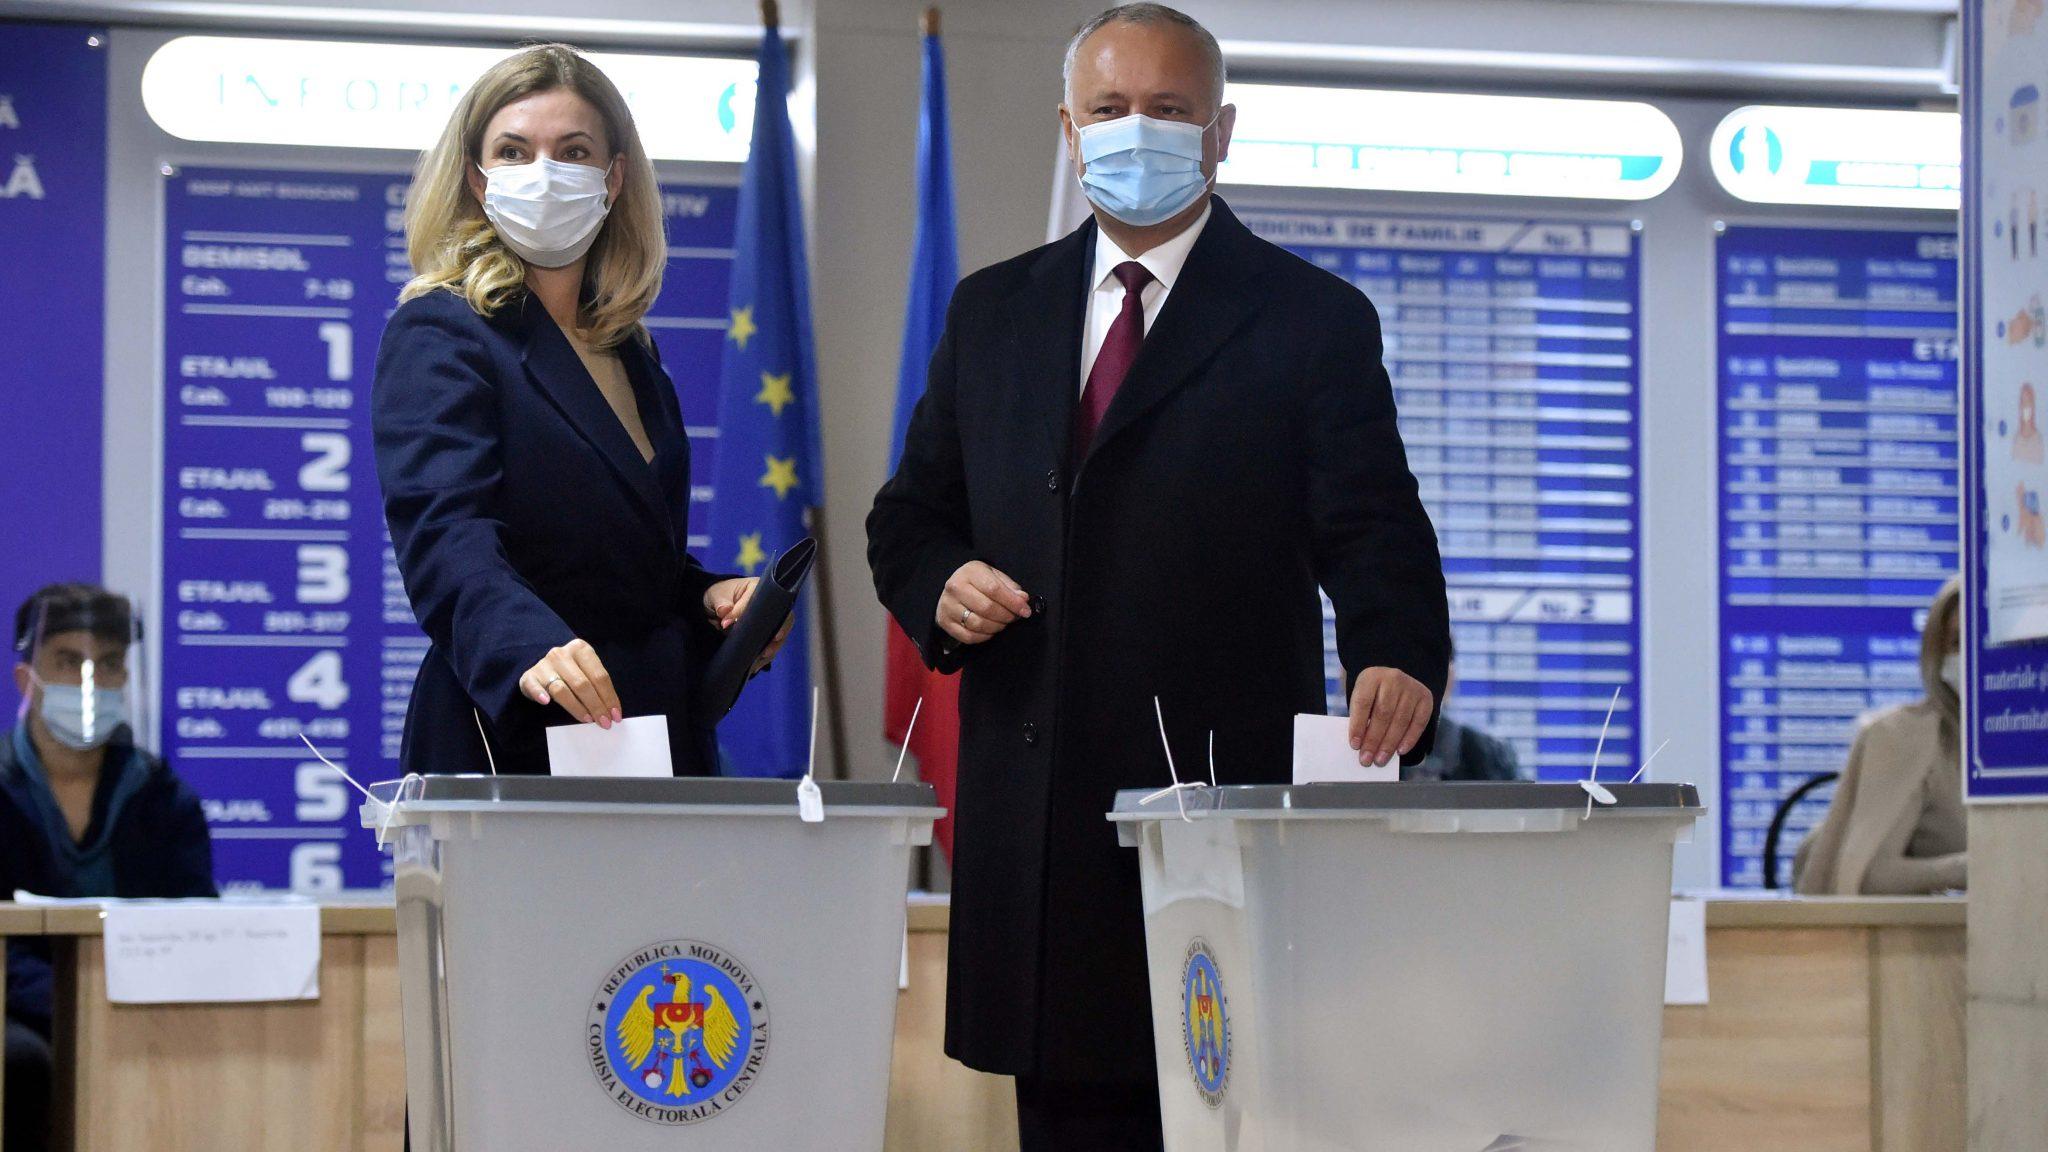 Moldova elects president amid Russia-West tug of war